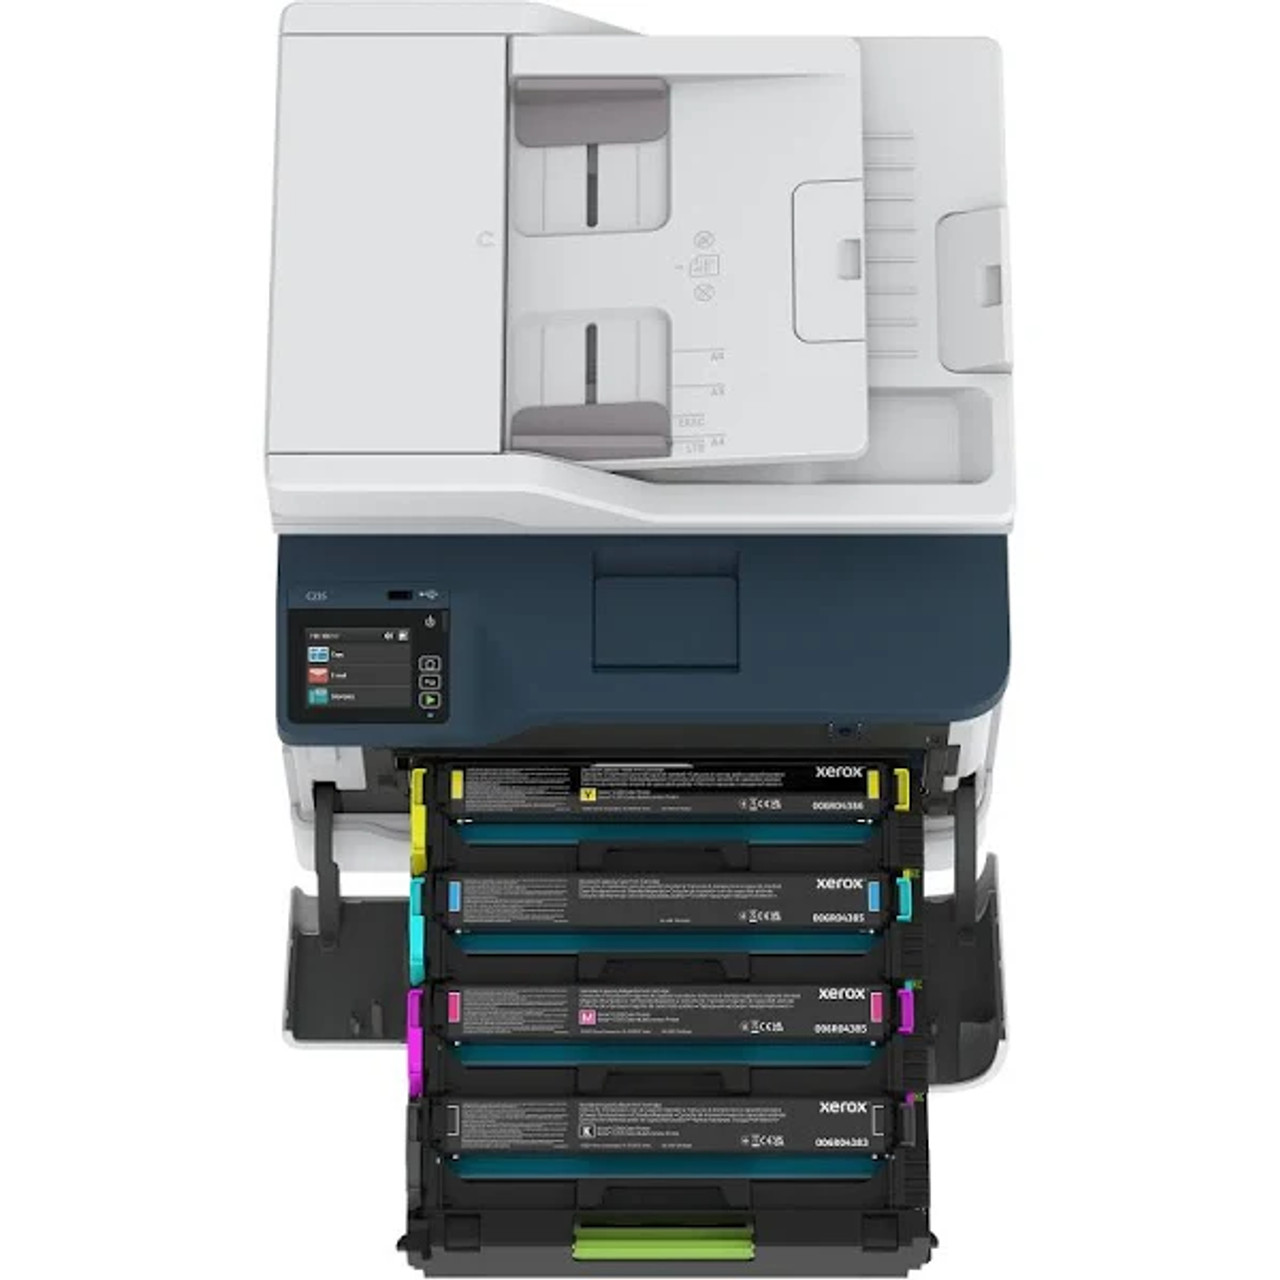 Xerox C235/DNI Laser Multifunction Printer - Color MFP